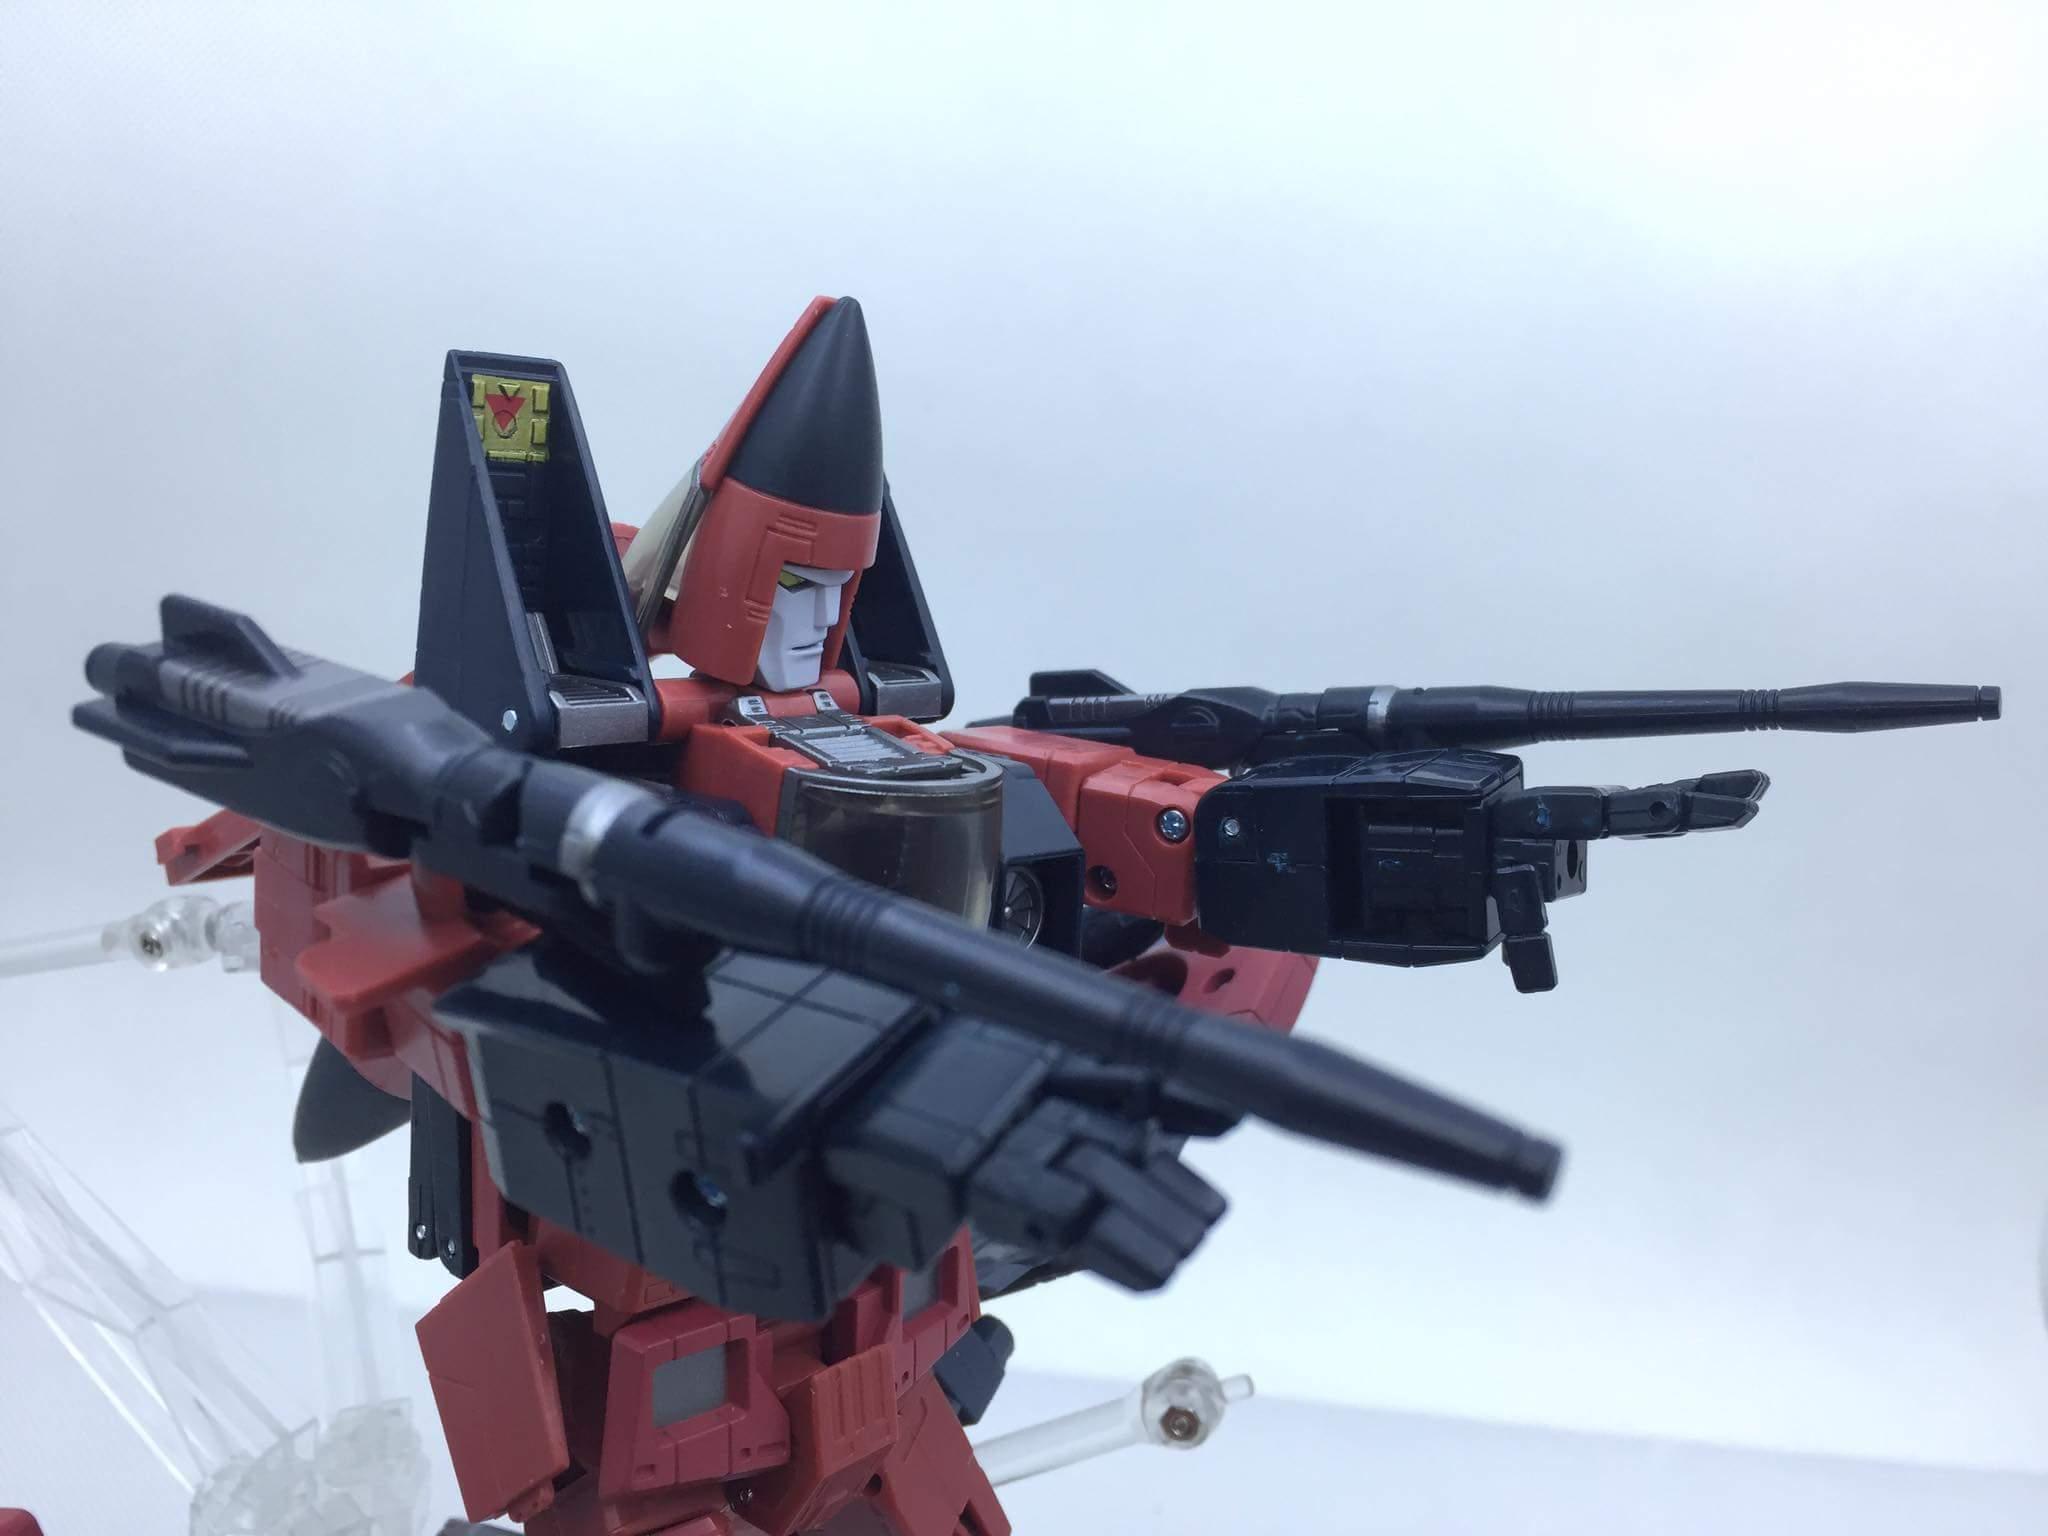 [Masterpiece] MP-11NT Thrust/Fatalo par Takara Tomy - Page 2 JRzicMNx